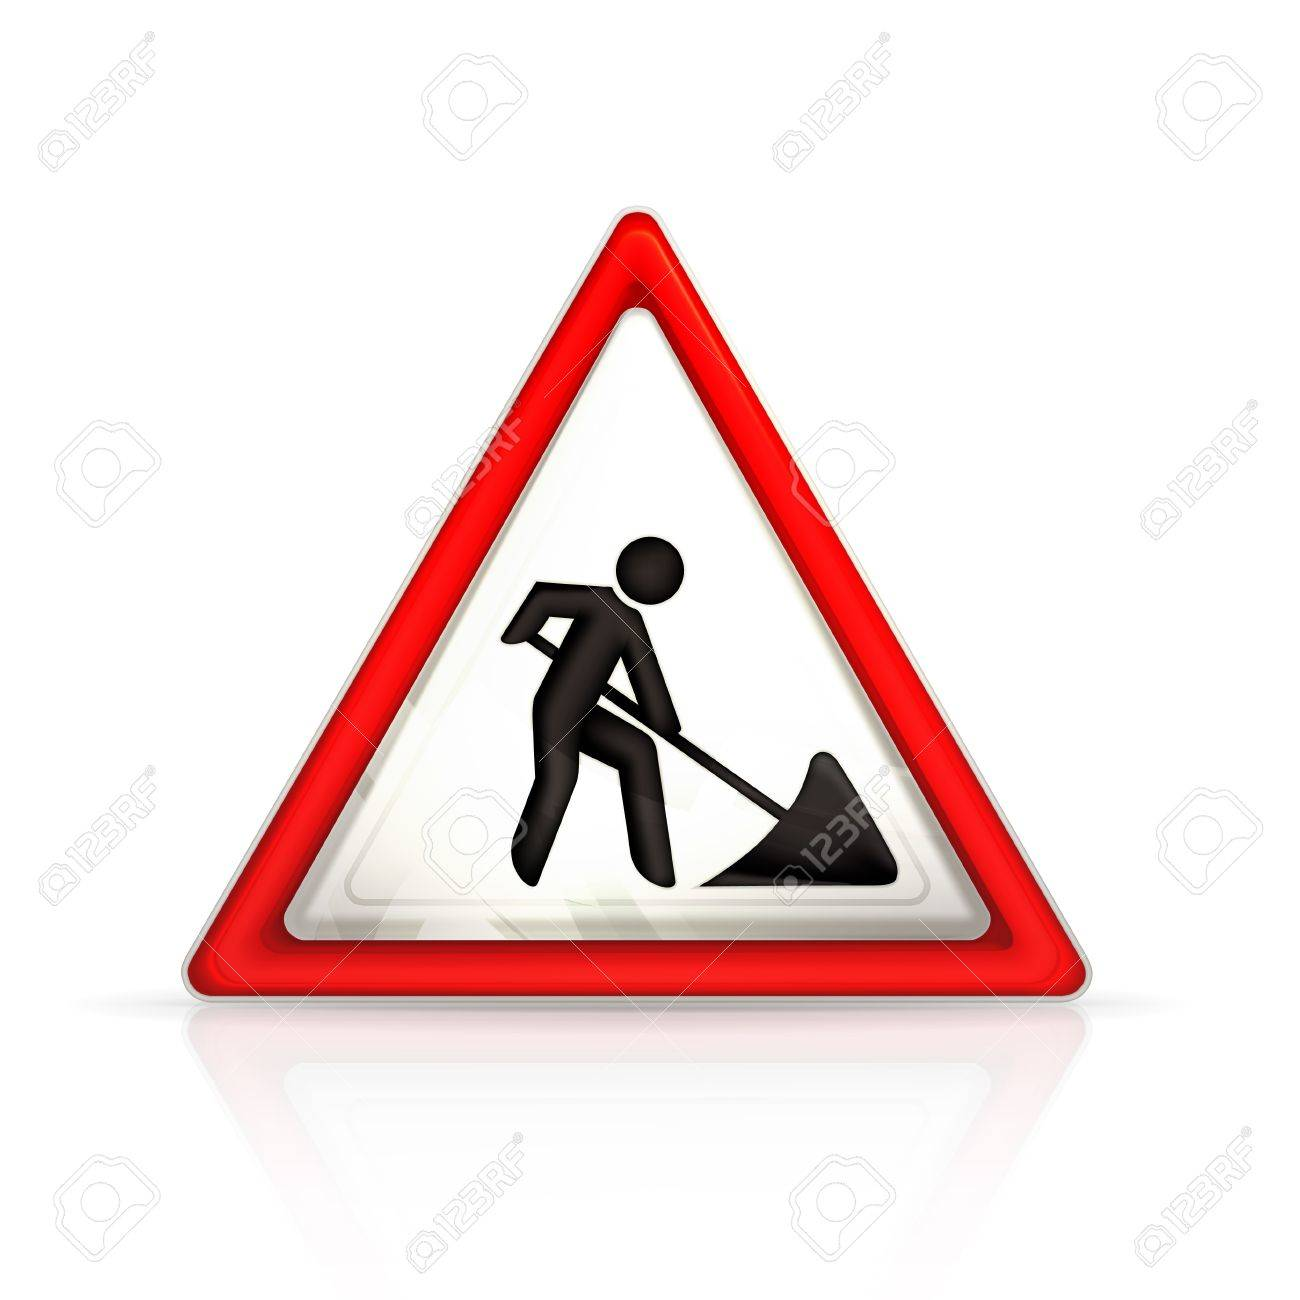 Roadworks sign Stock Vector - 13898697